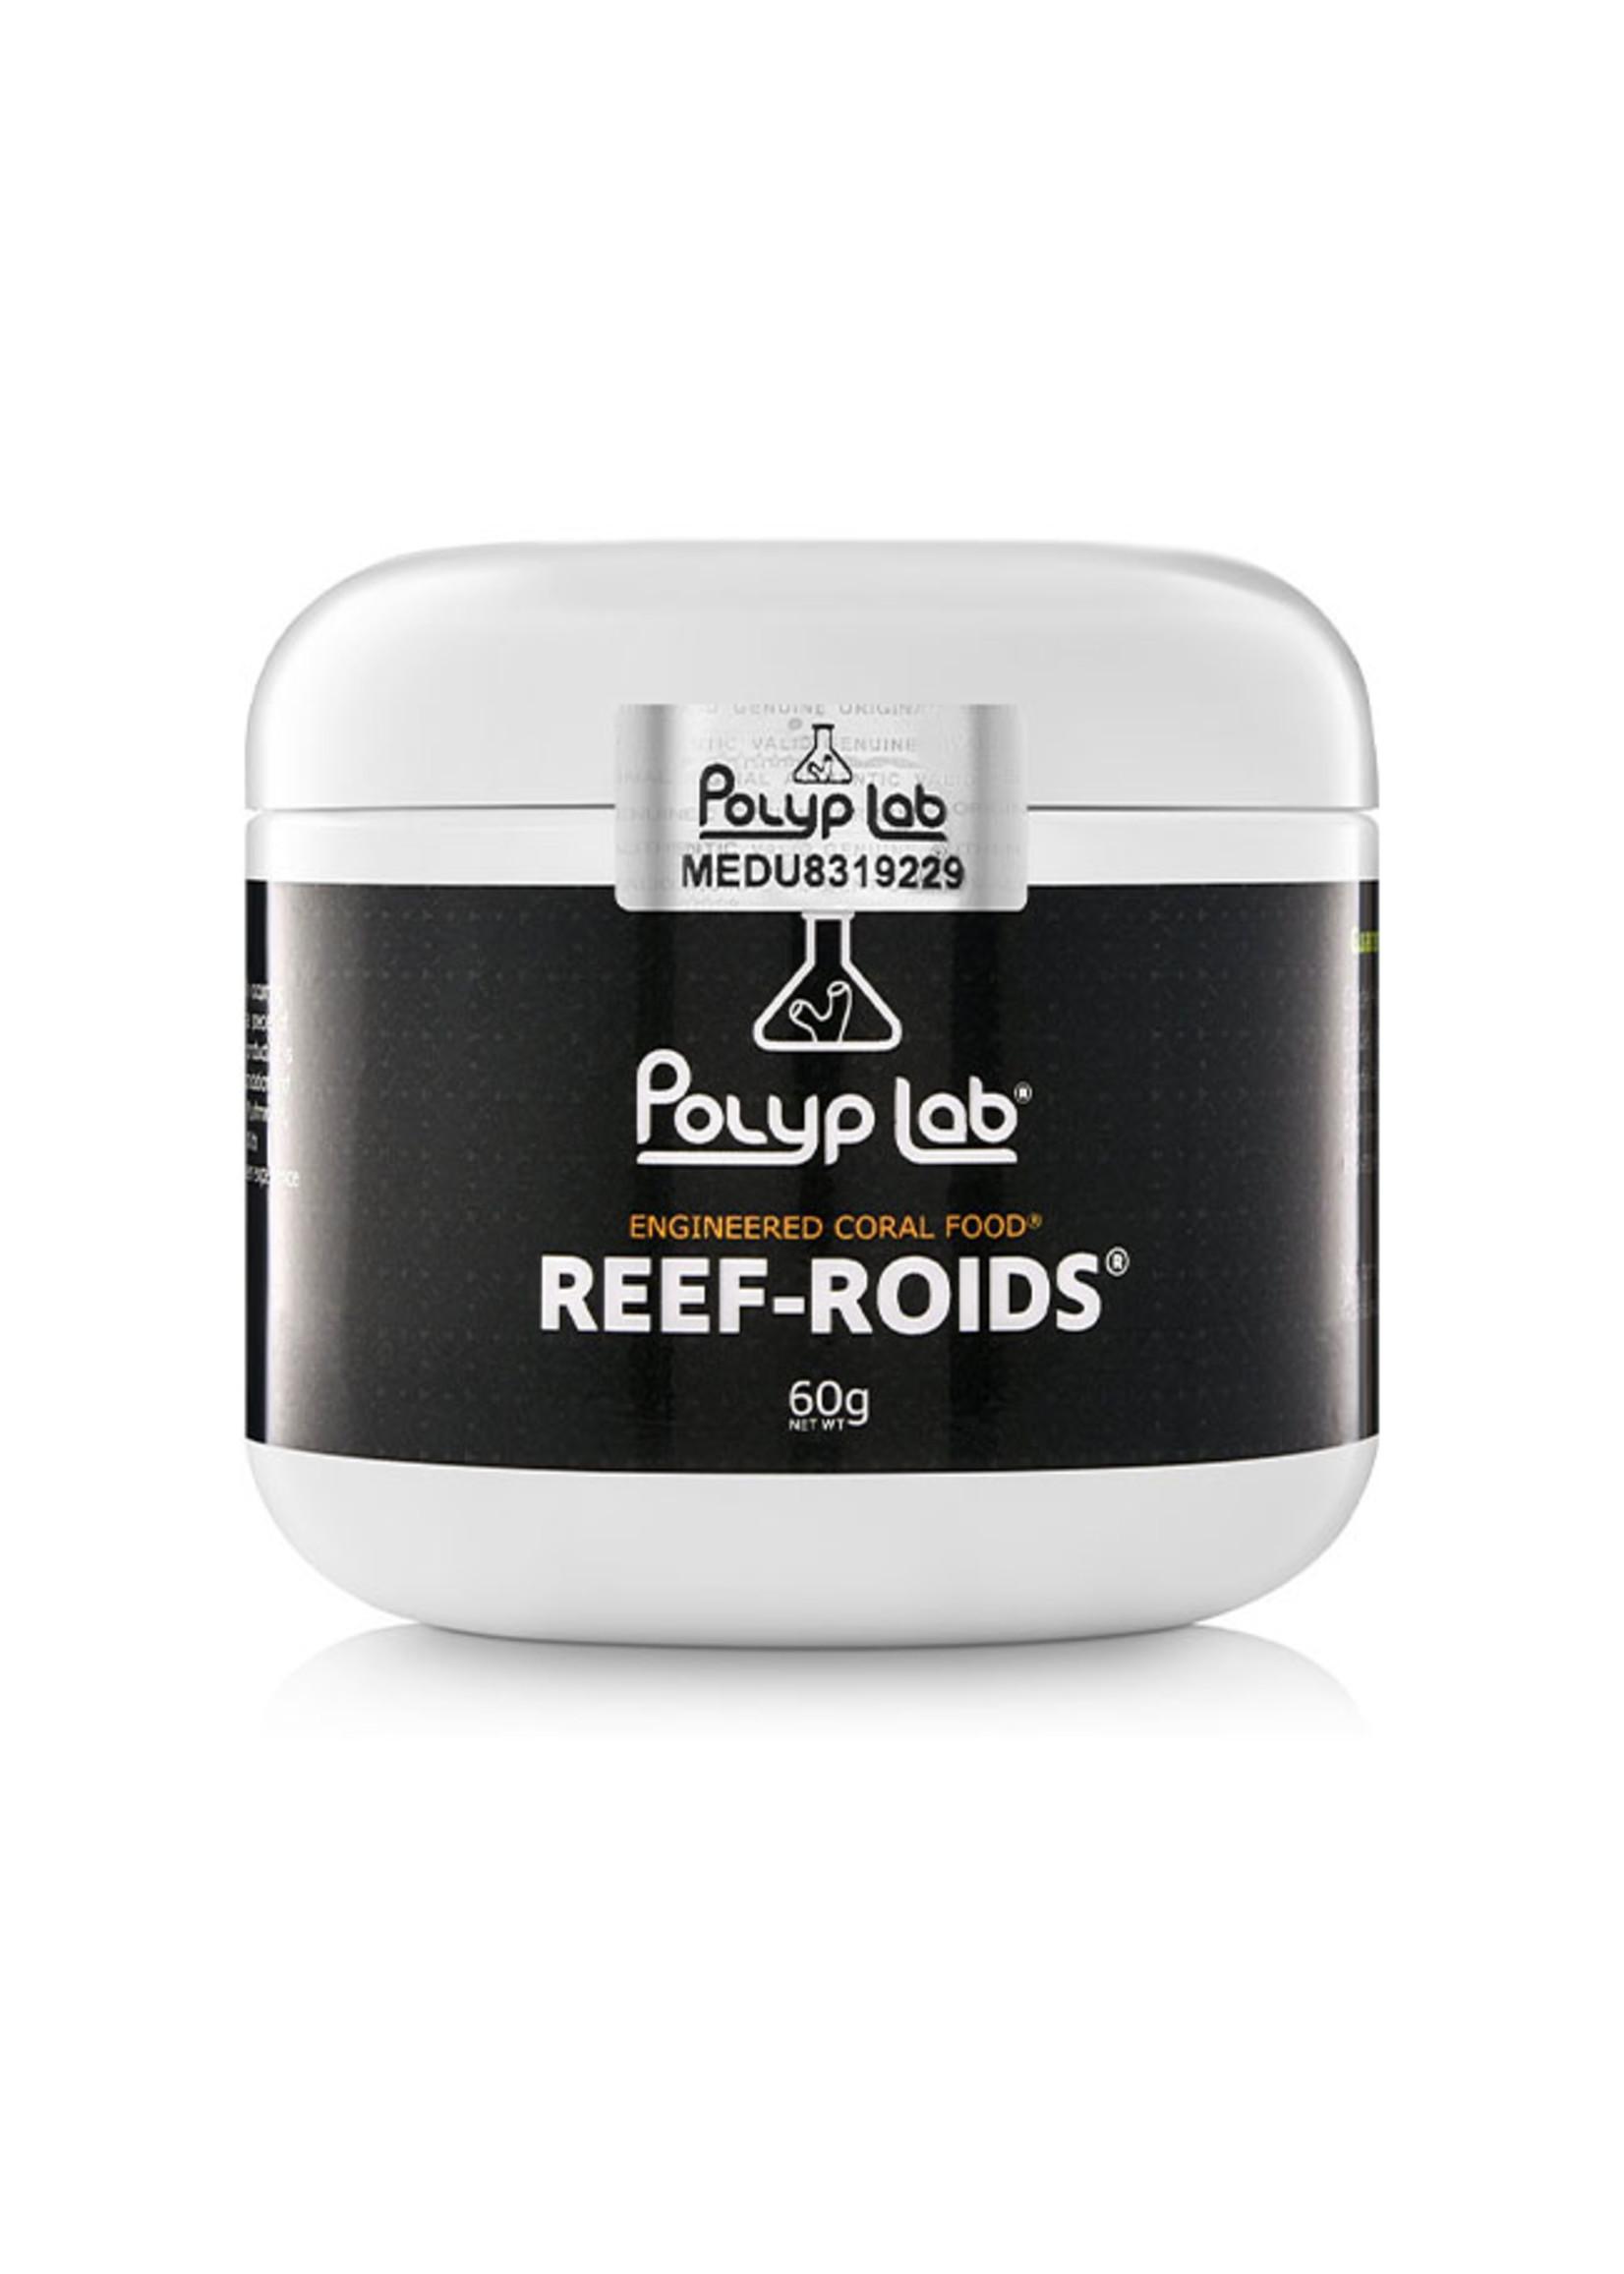 PolypLab PolypLab Reef-Roids